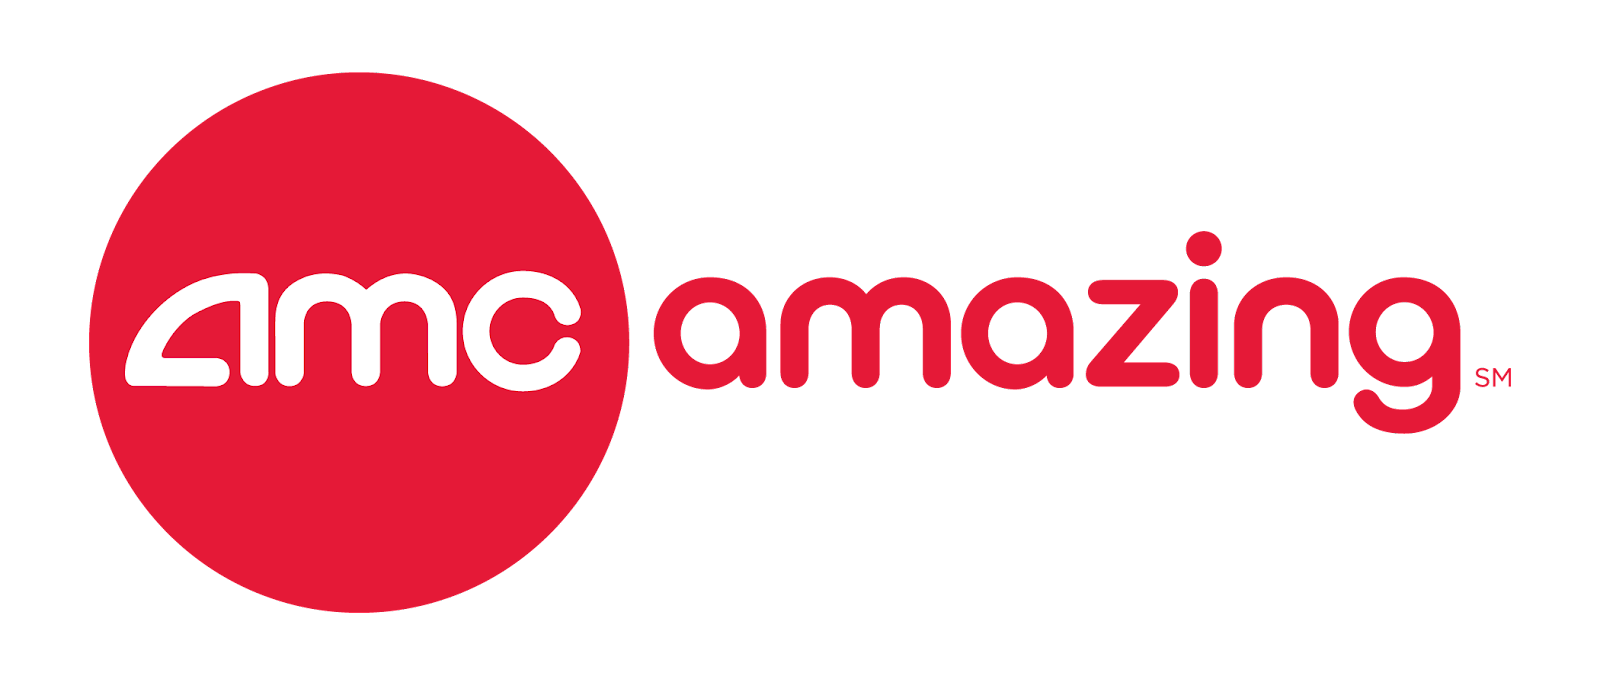 AMCamazing_Horz_Positive_186